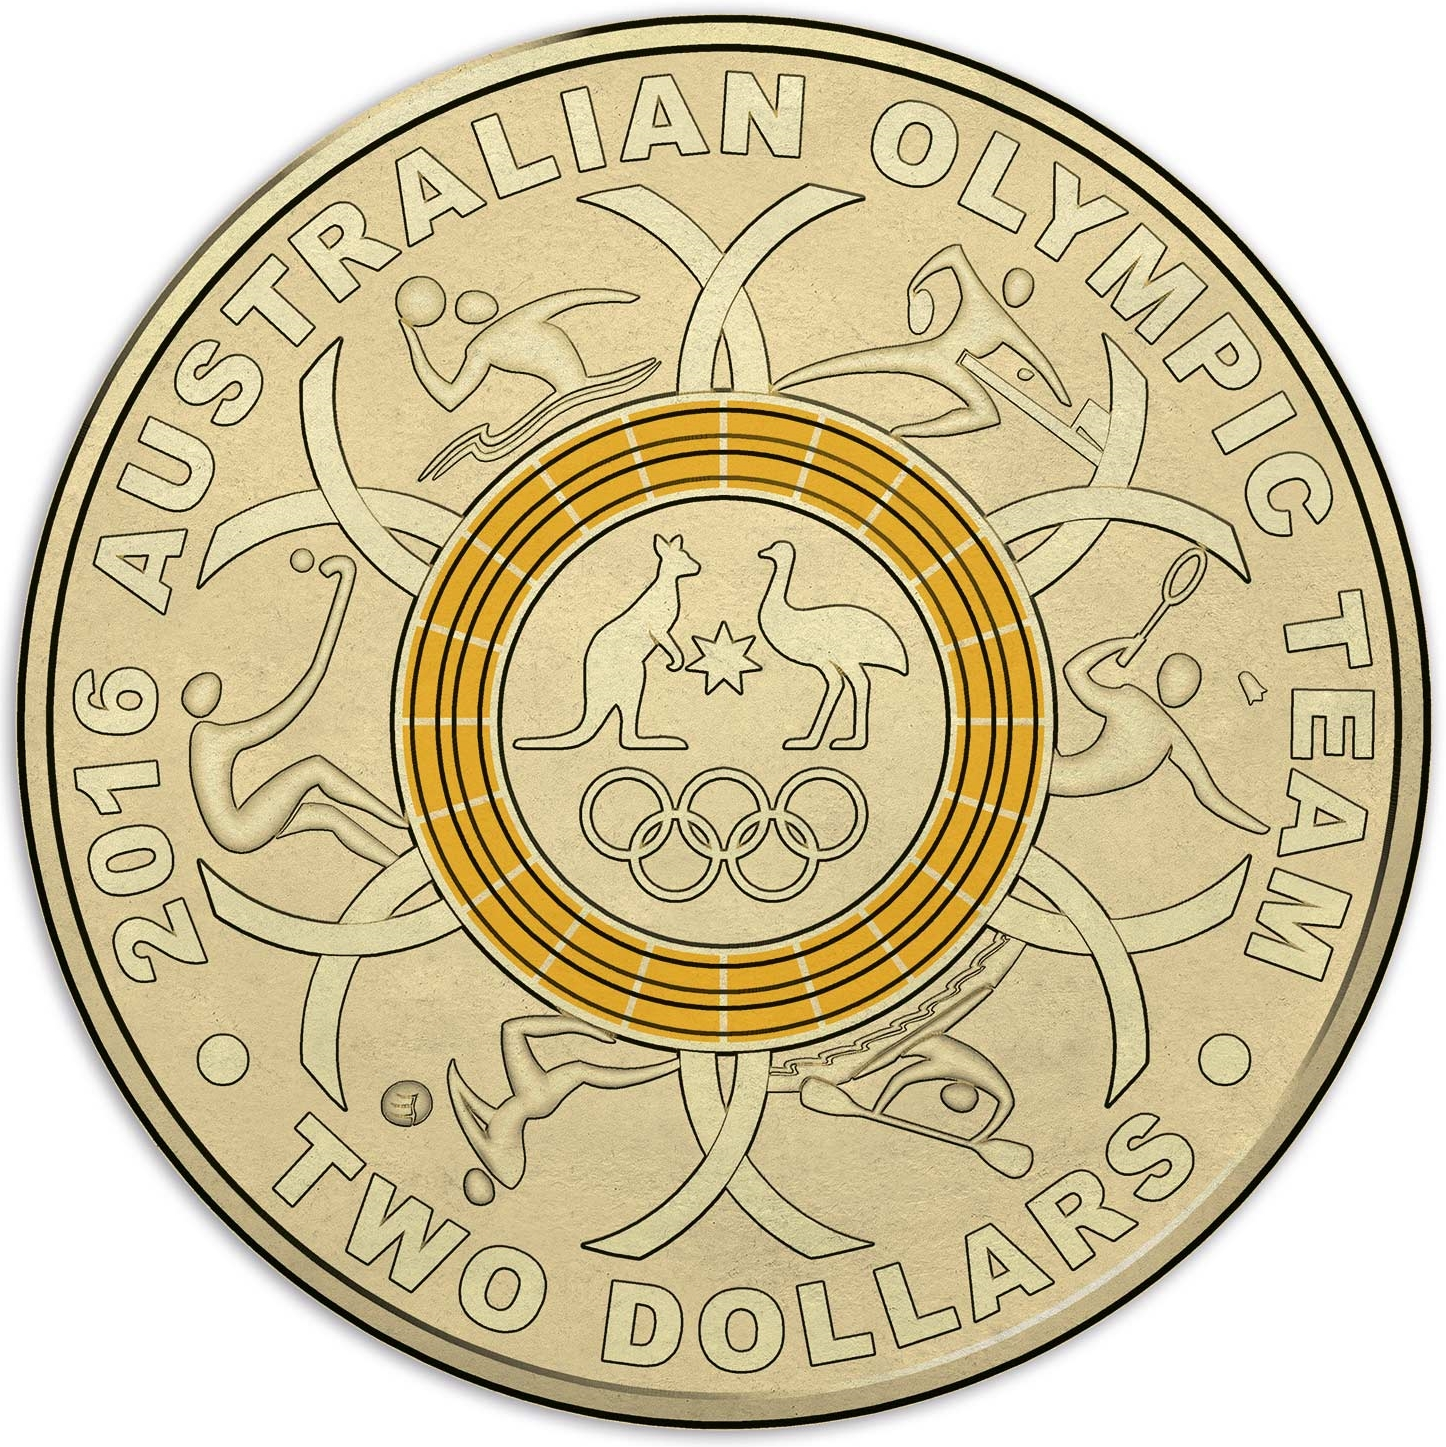 2 Dollars Elizabeth Ii 2016 Australian Olympic Team